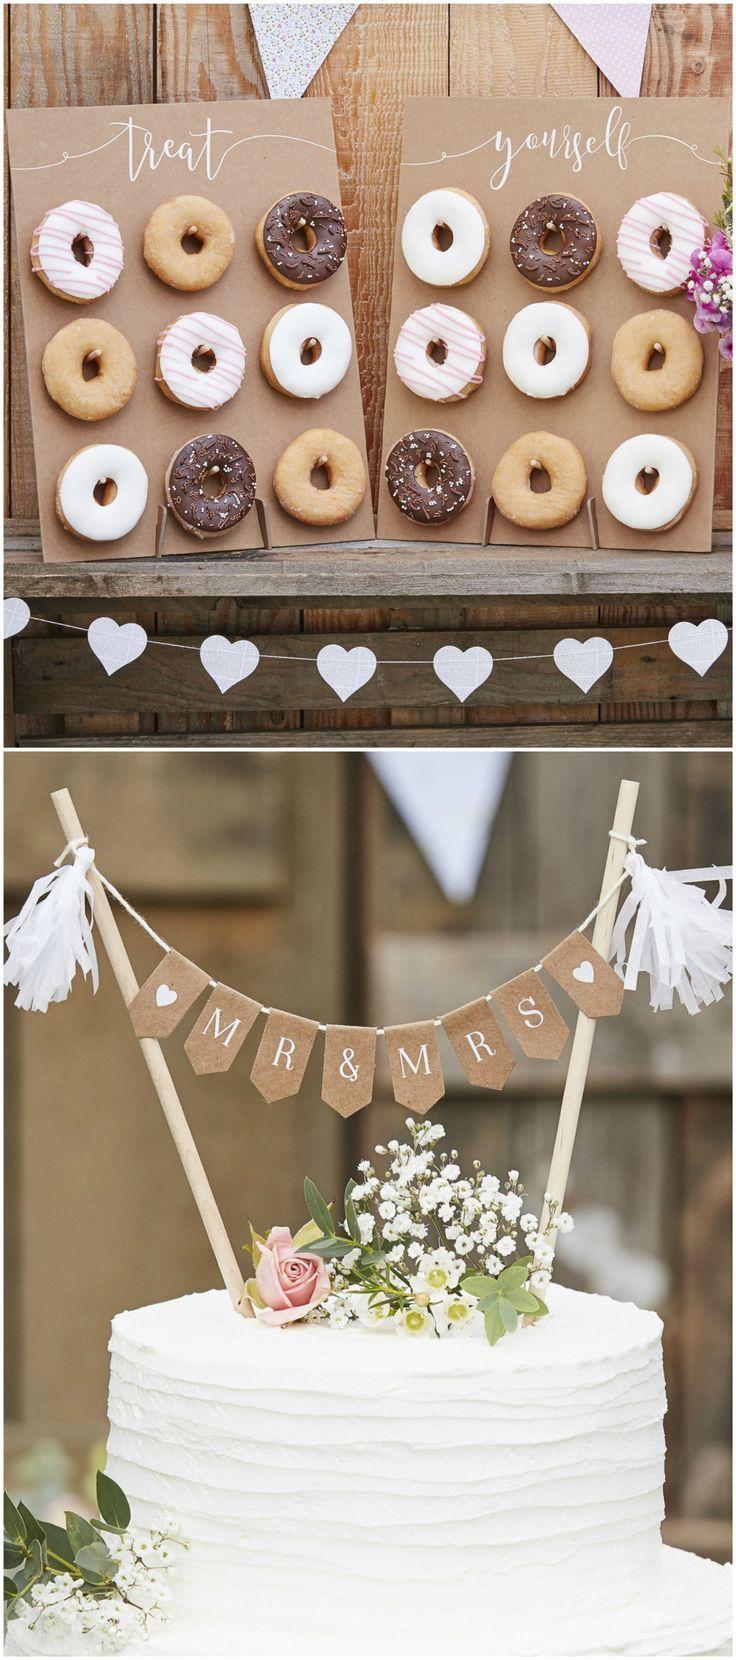 vintage hochzeit dekorations ideen  boho I rustic I wedding I fairy lights I lic… – #Boho #dekorations #Fairy #Hochzeit #Ideen #lic #Lights #Rustic #Vintage #Wedding